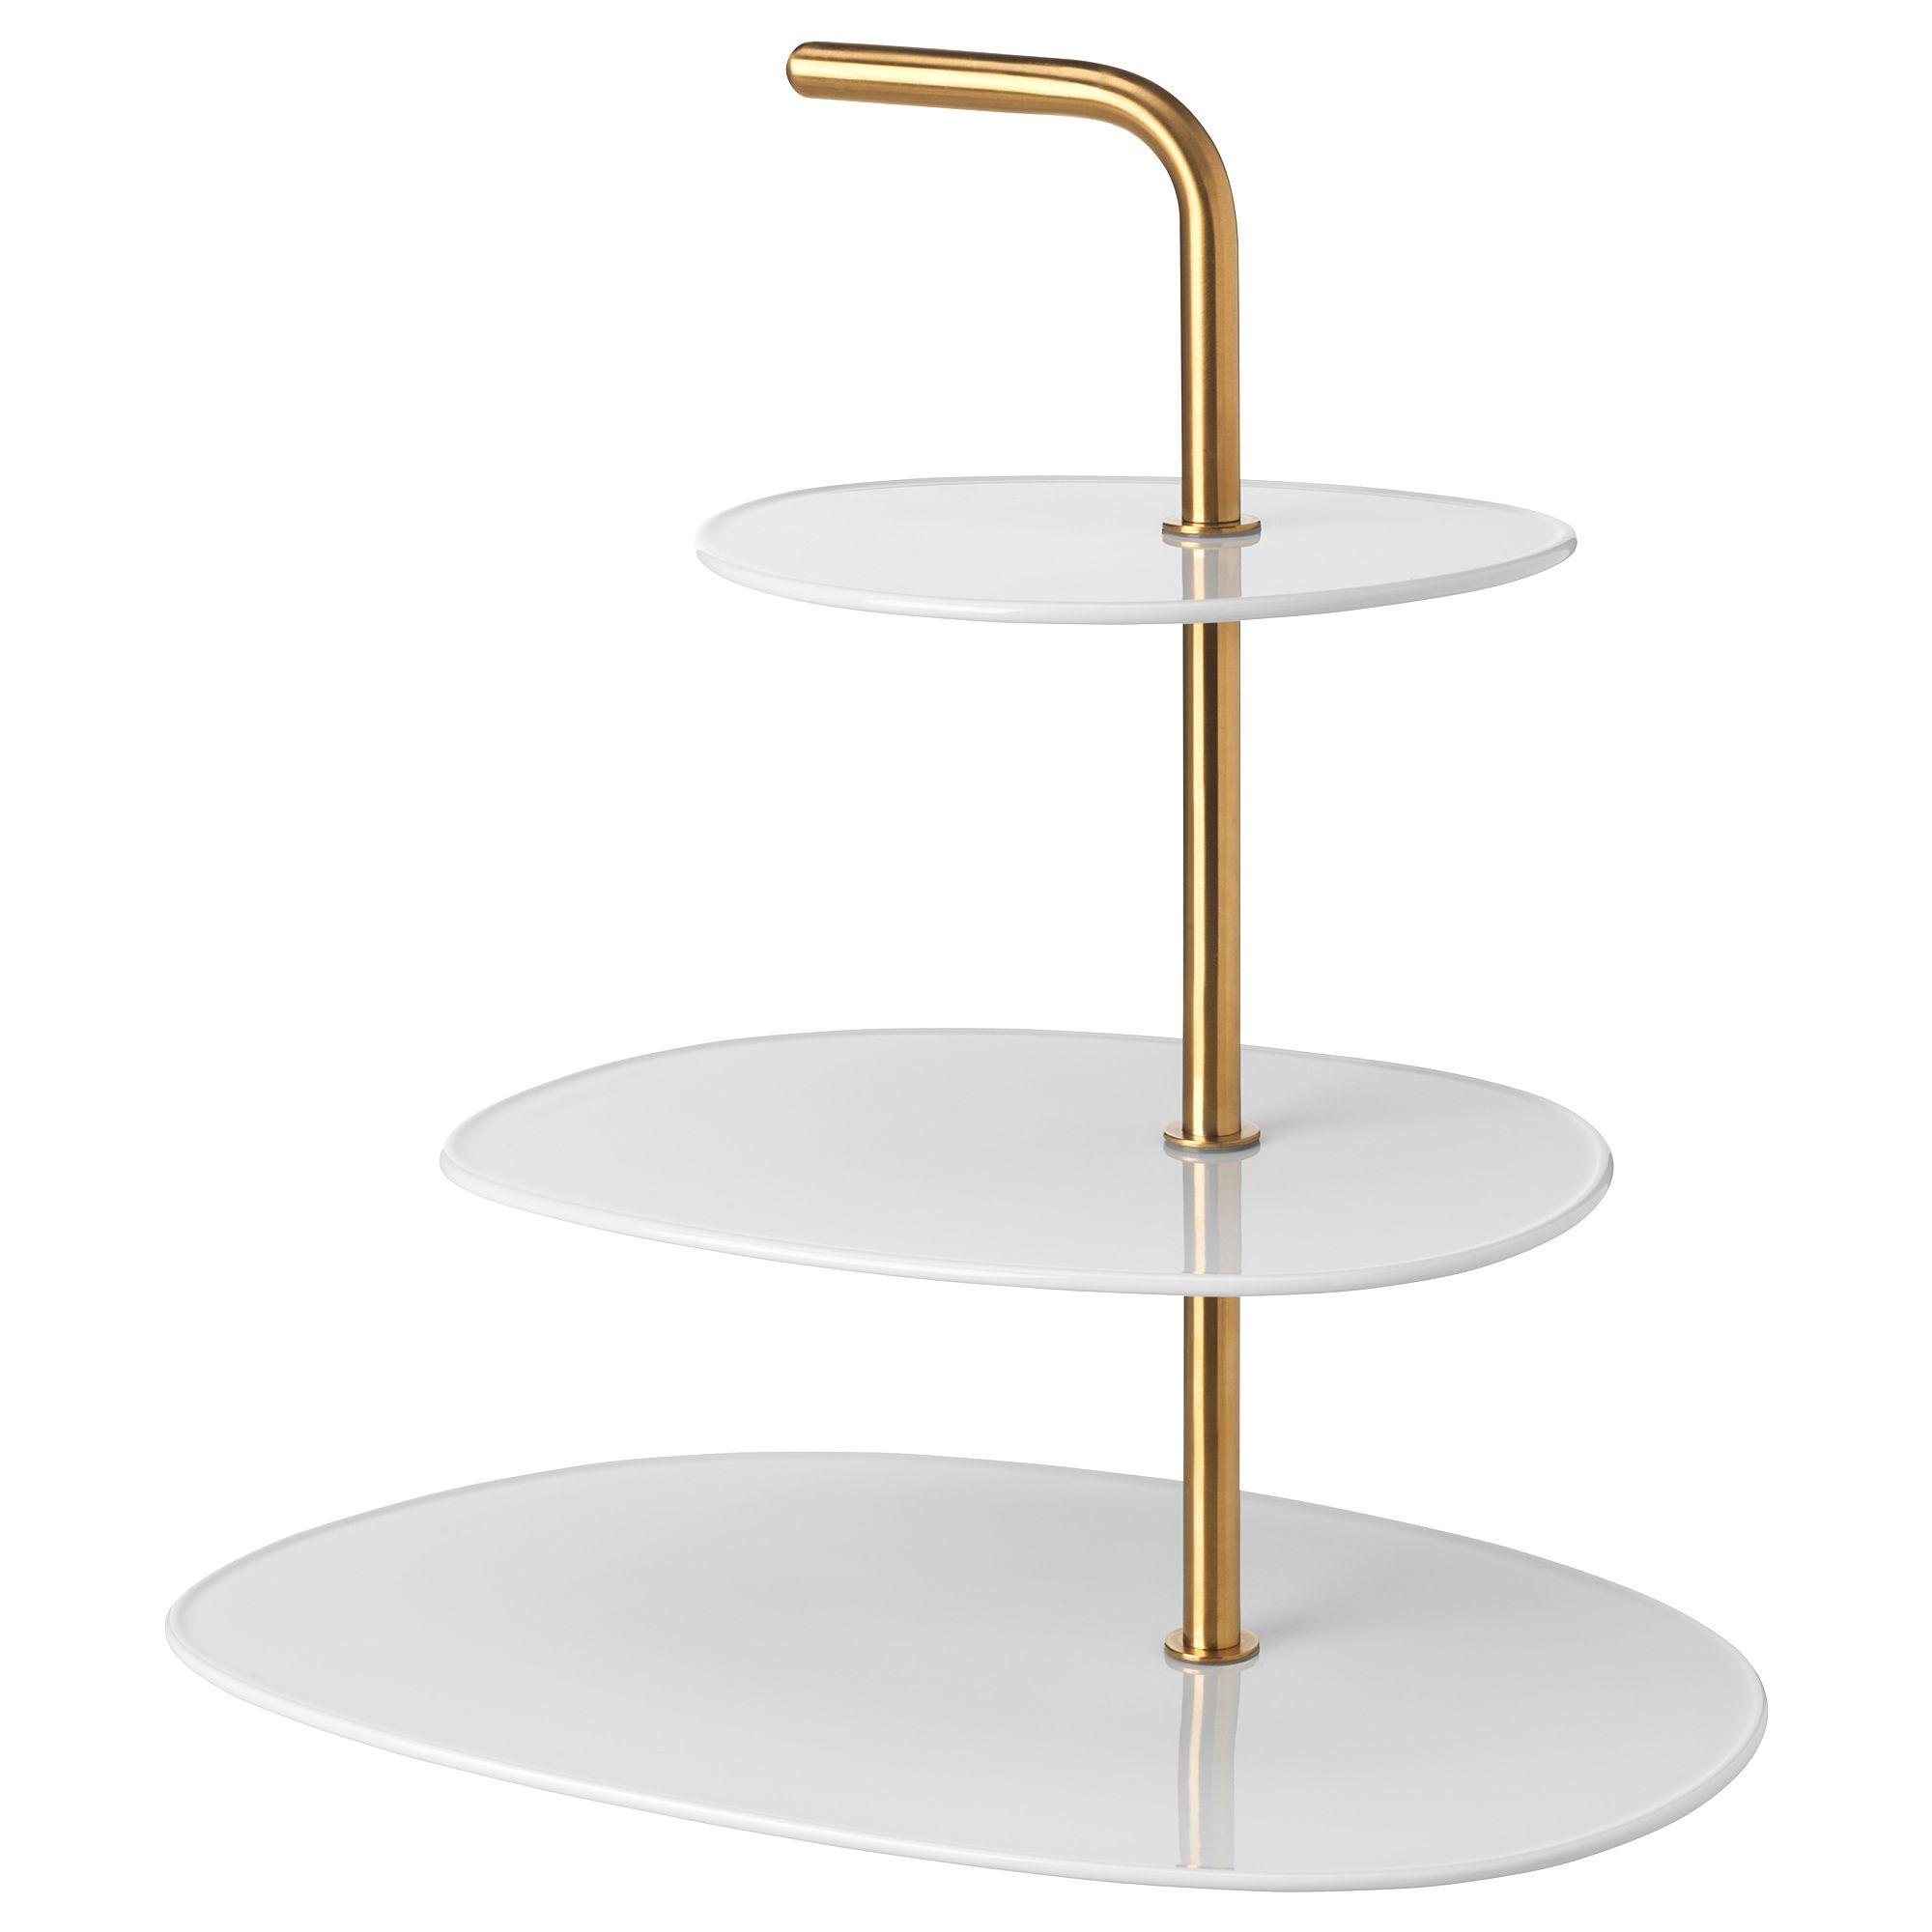 Us Furniture And Home Furnishings Ikea Cake Stand Serving Stand Ikea